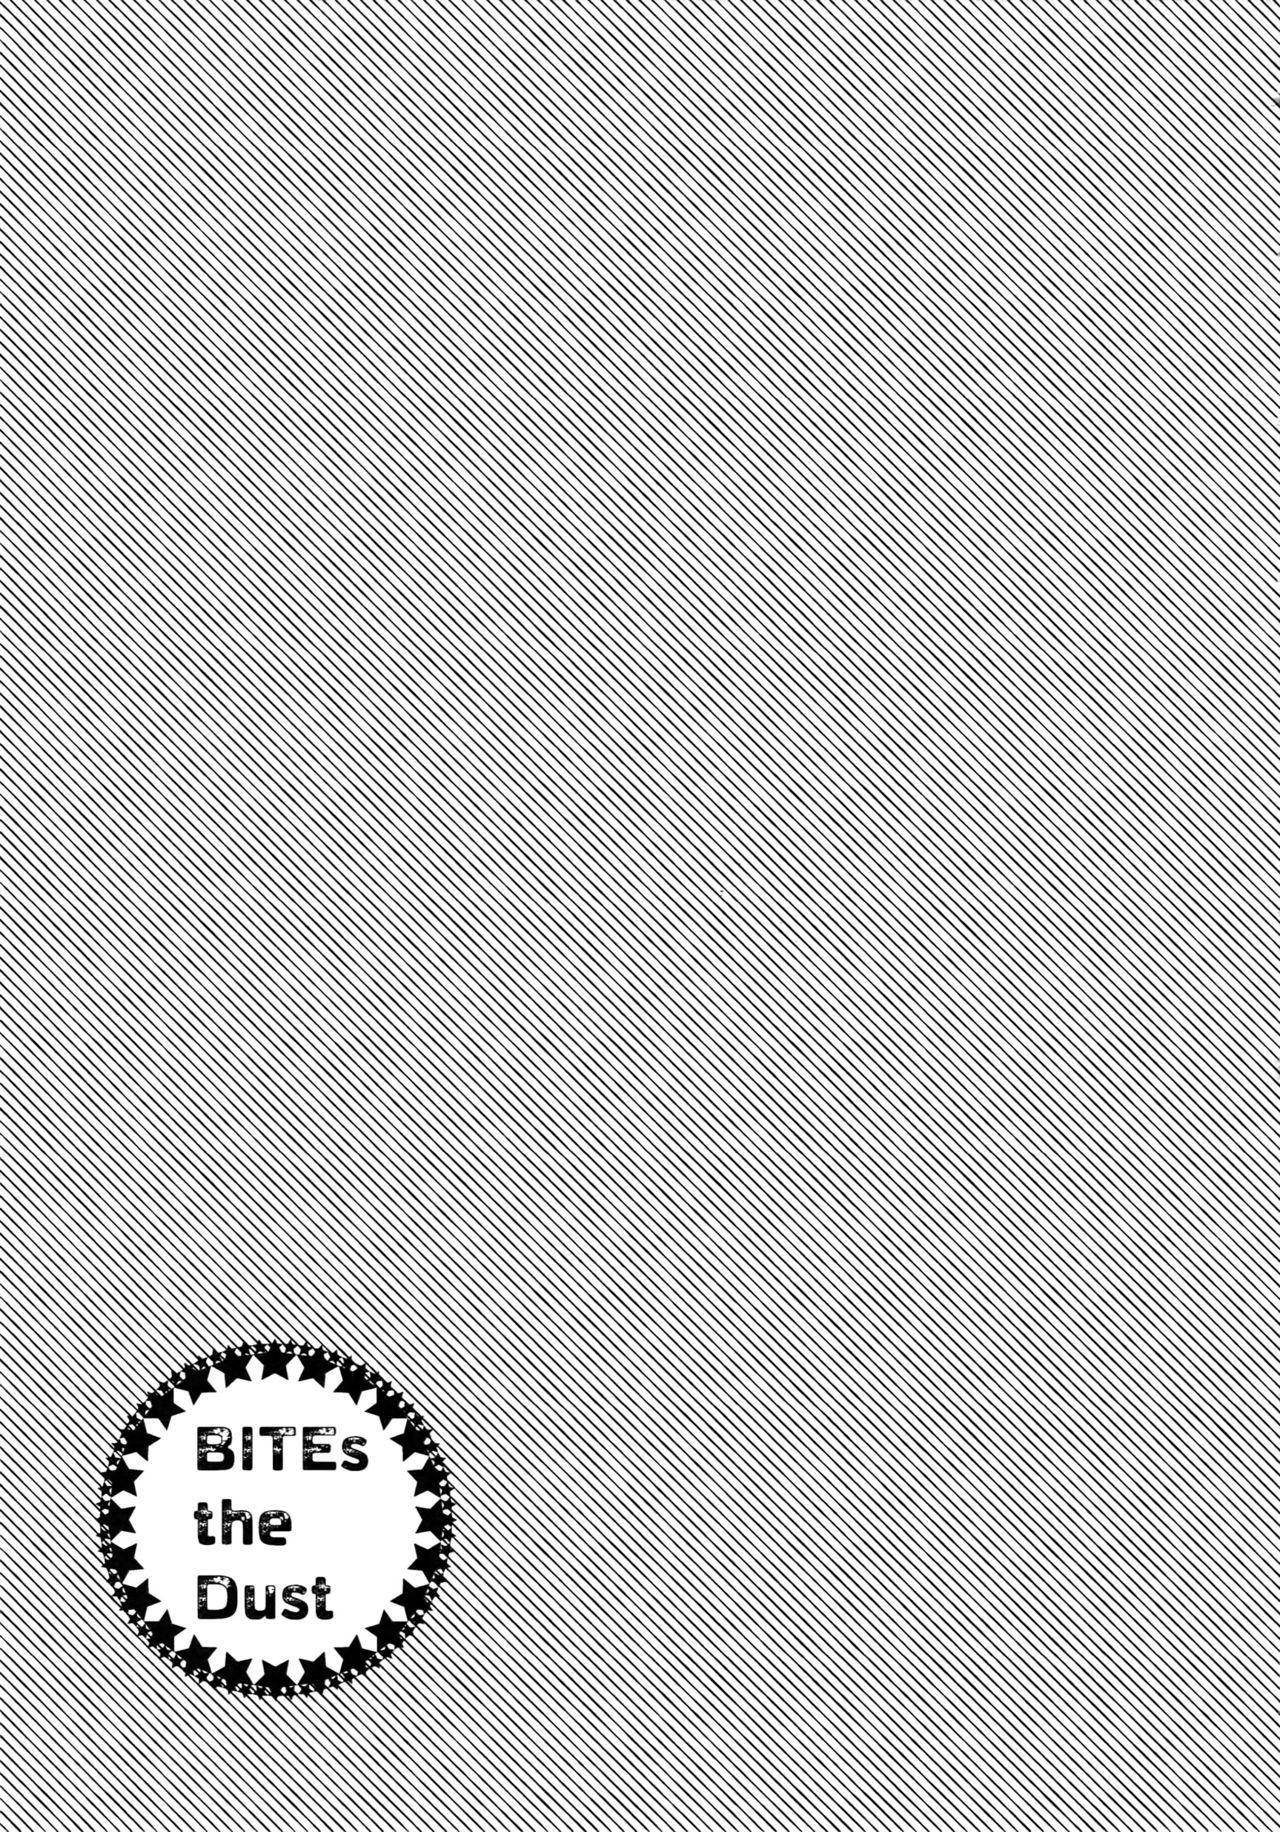 BITEs the Dust 252